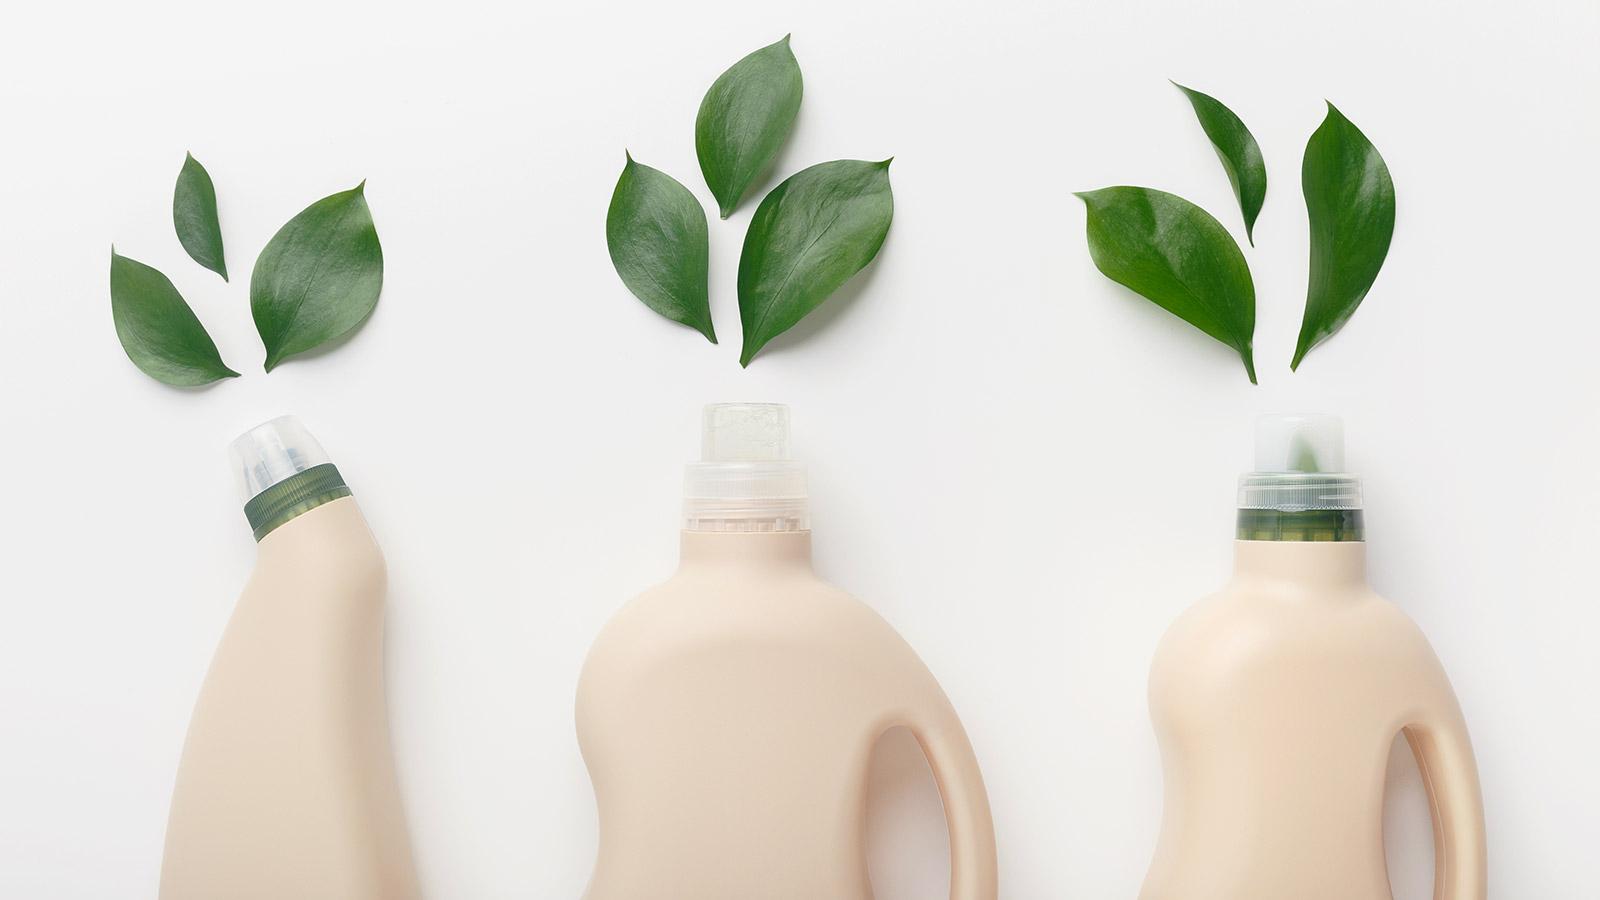 Imagem Impacto ambiental de los detergentes